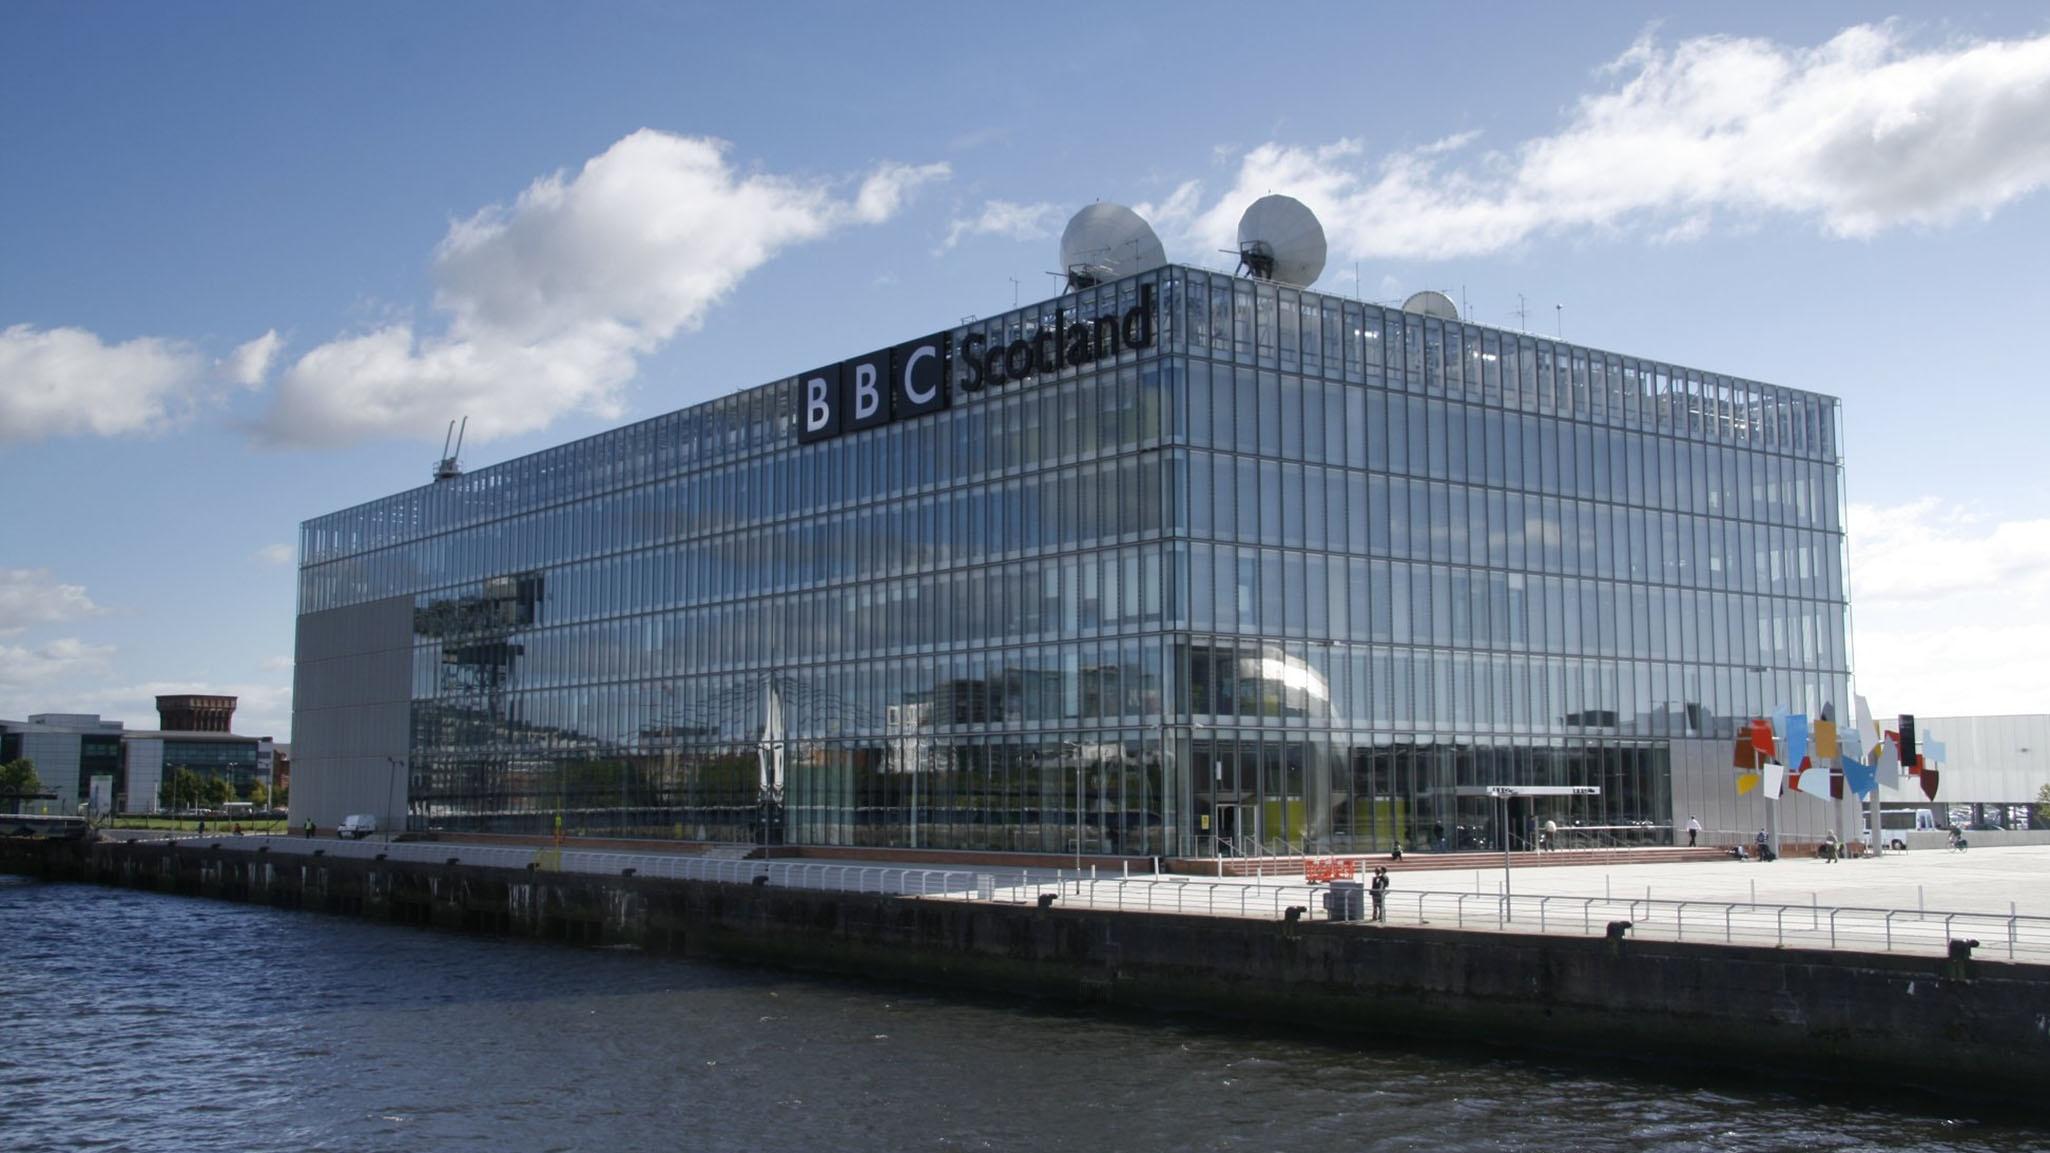 bbc scotland - photo #25